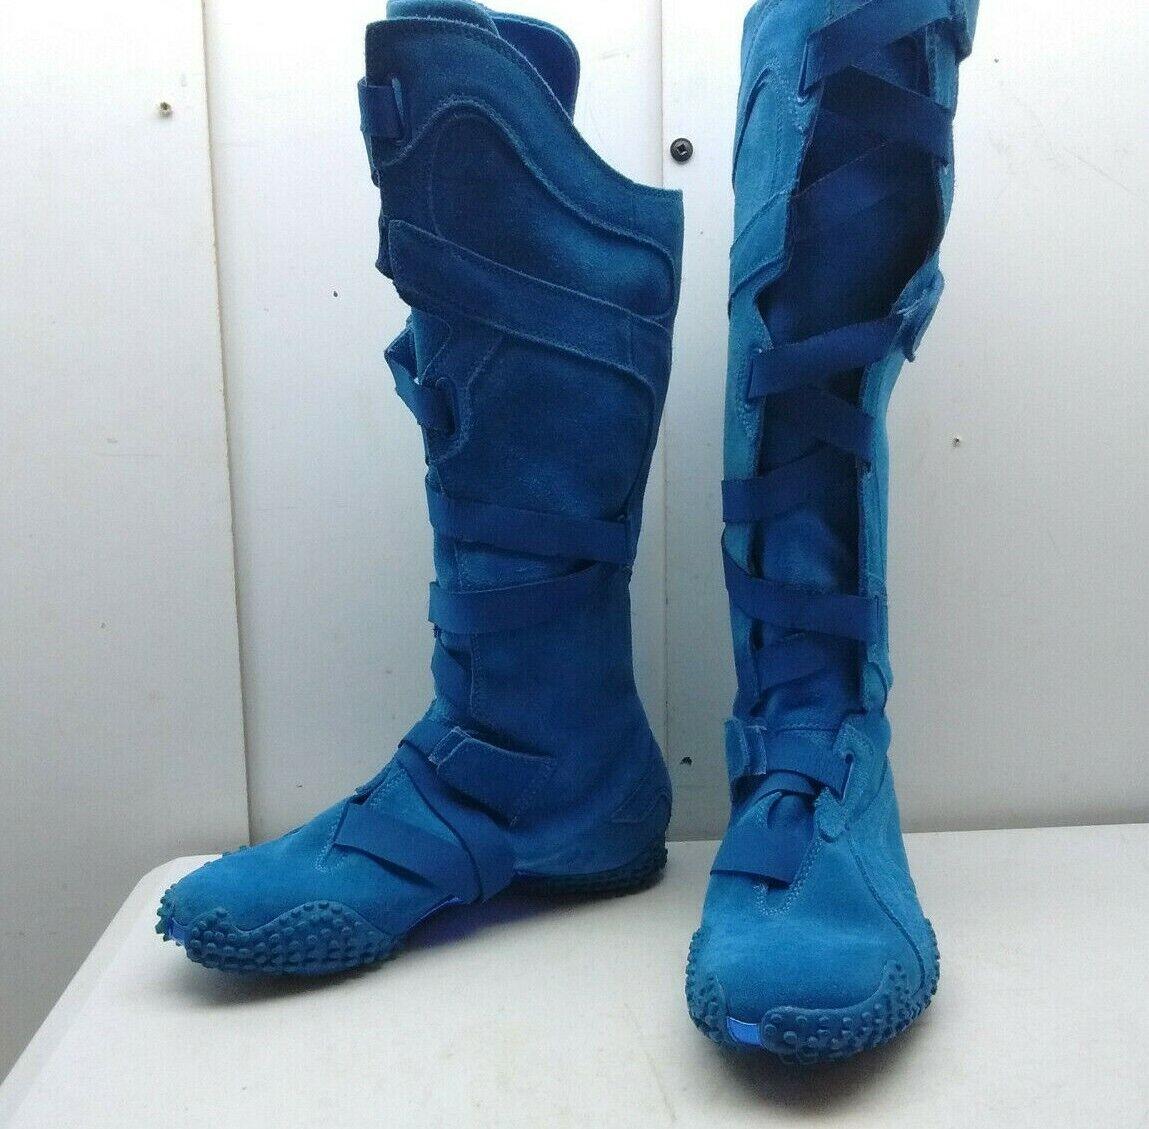 outlet online economico PUMA Special Edition blu Suede Suede Suede Tall Kneel Hi scarpe da ginnastica avvio Donna  scarpe 8W 38.5  grande sconto